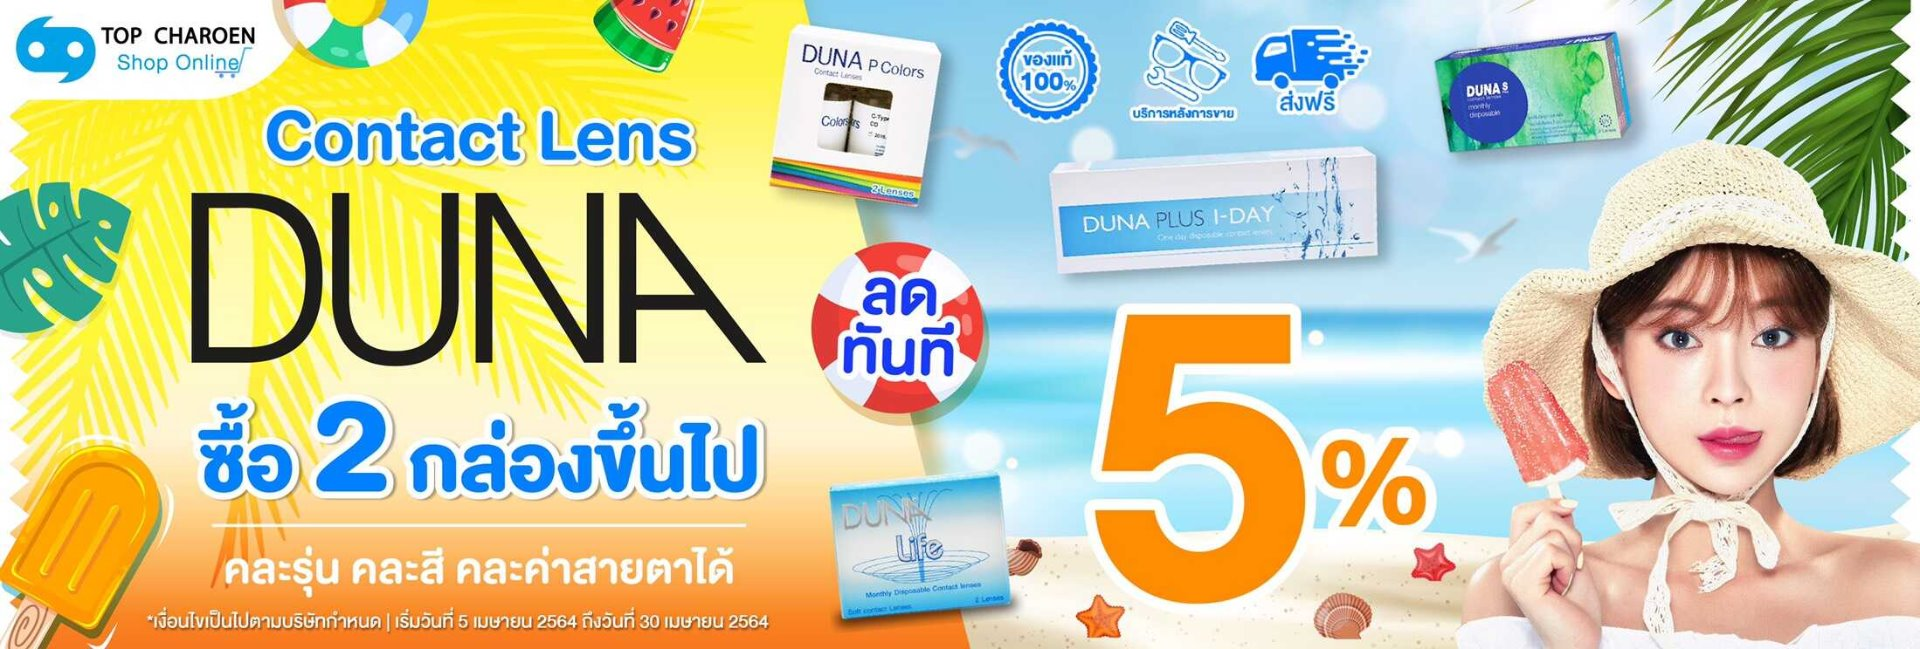 Contact Lens Duna ซื้อ 2 กล่องขึ้นไป ลดทันที 5%